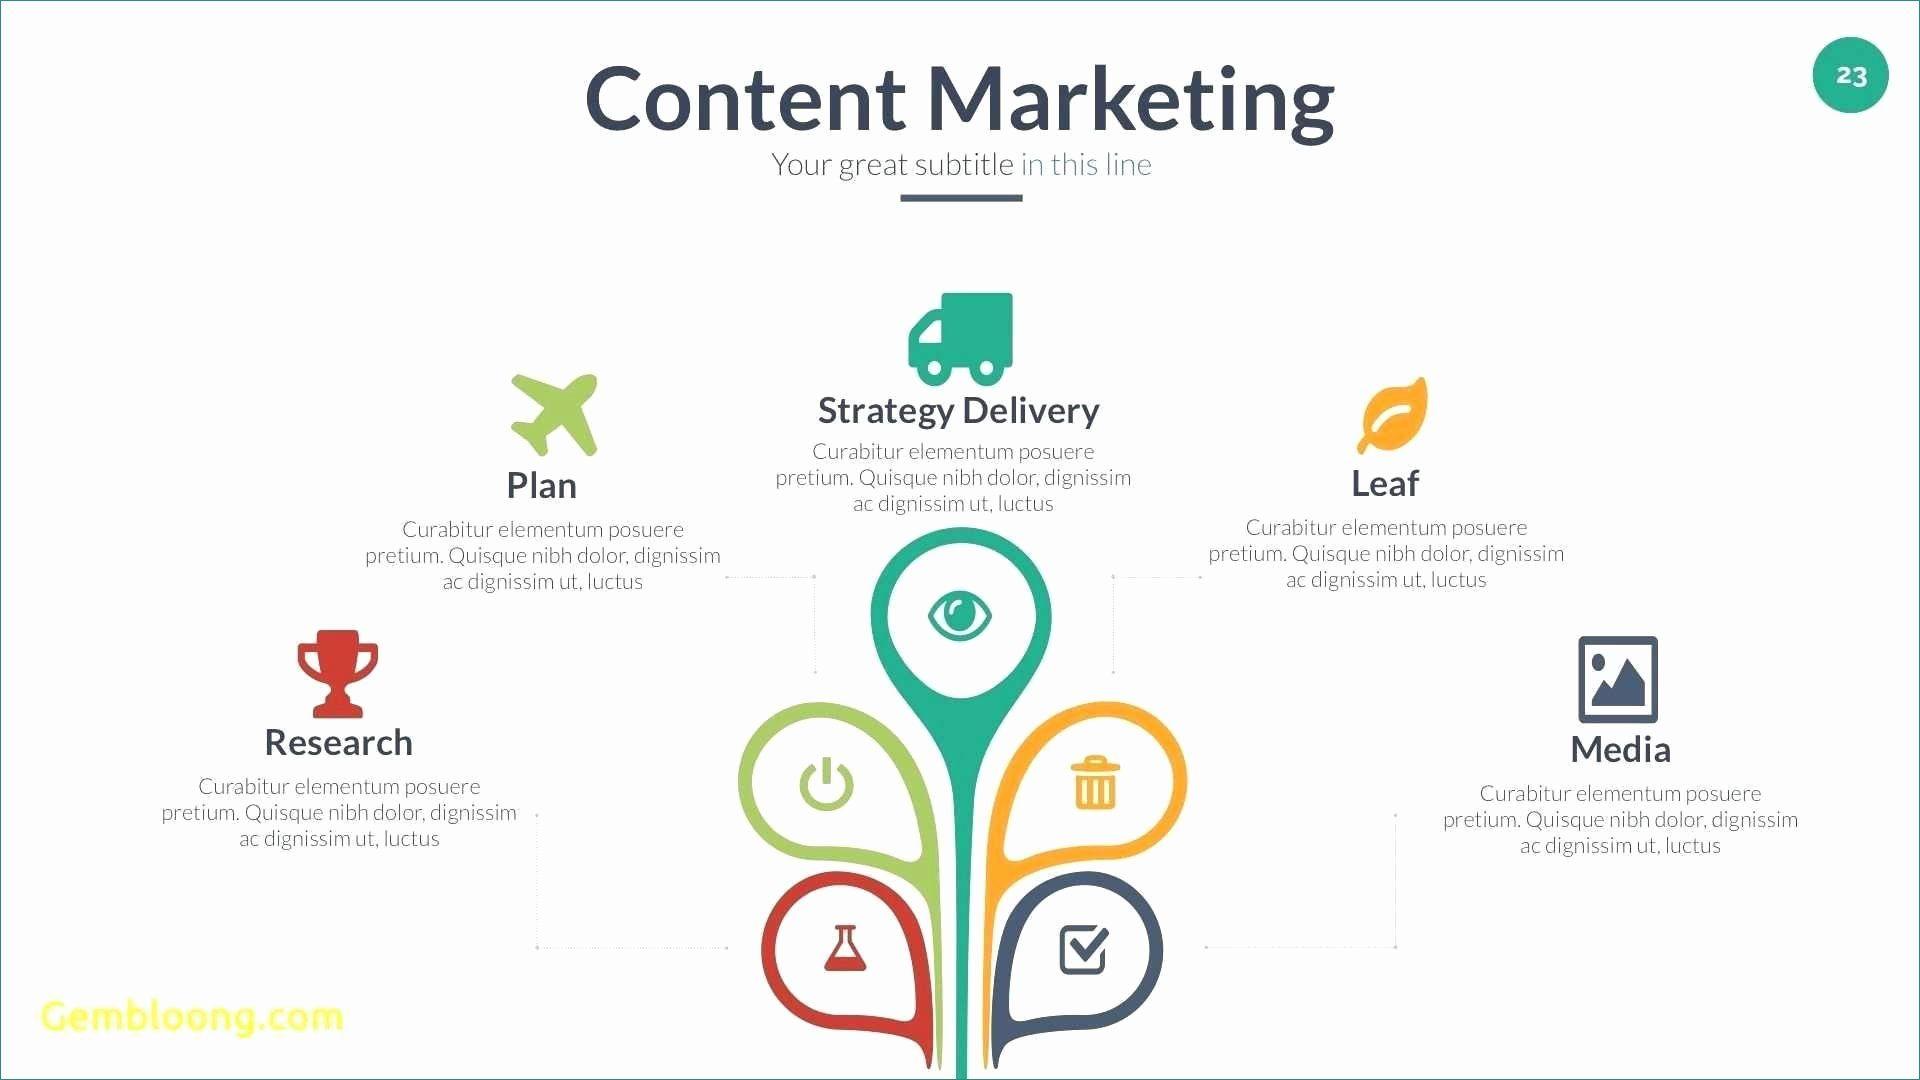 Free Marketing Powerpoint Presentation Templates Making An Aesthetically Presentation Templates Best Presentation Templates Powerpoint Presentation Templates